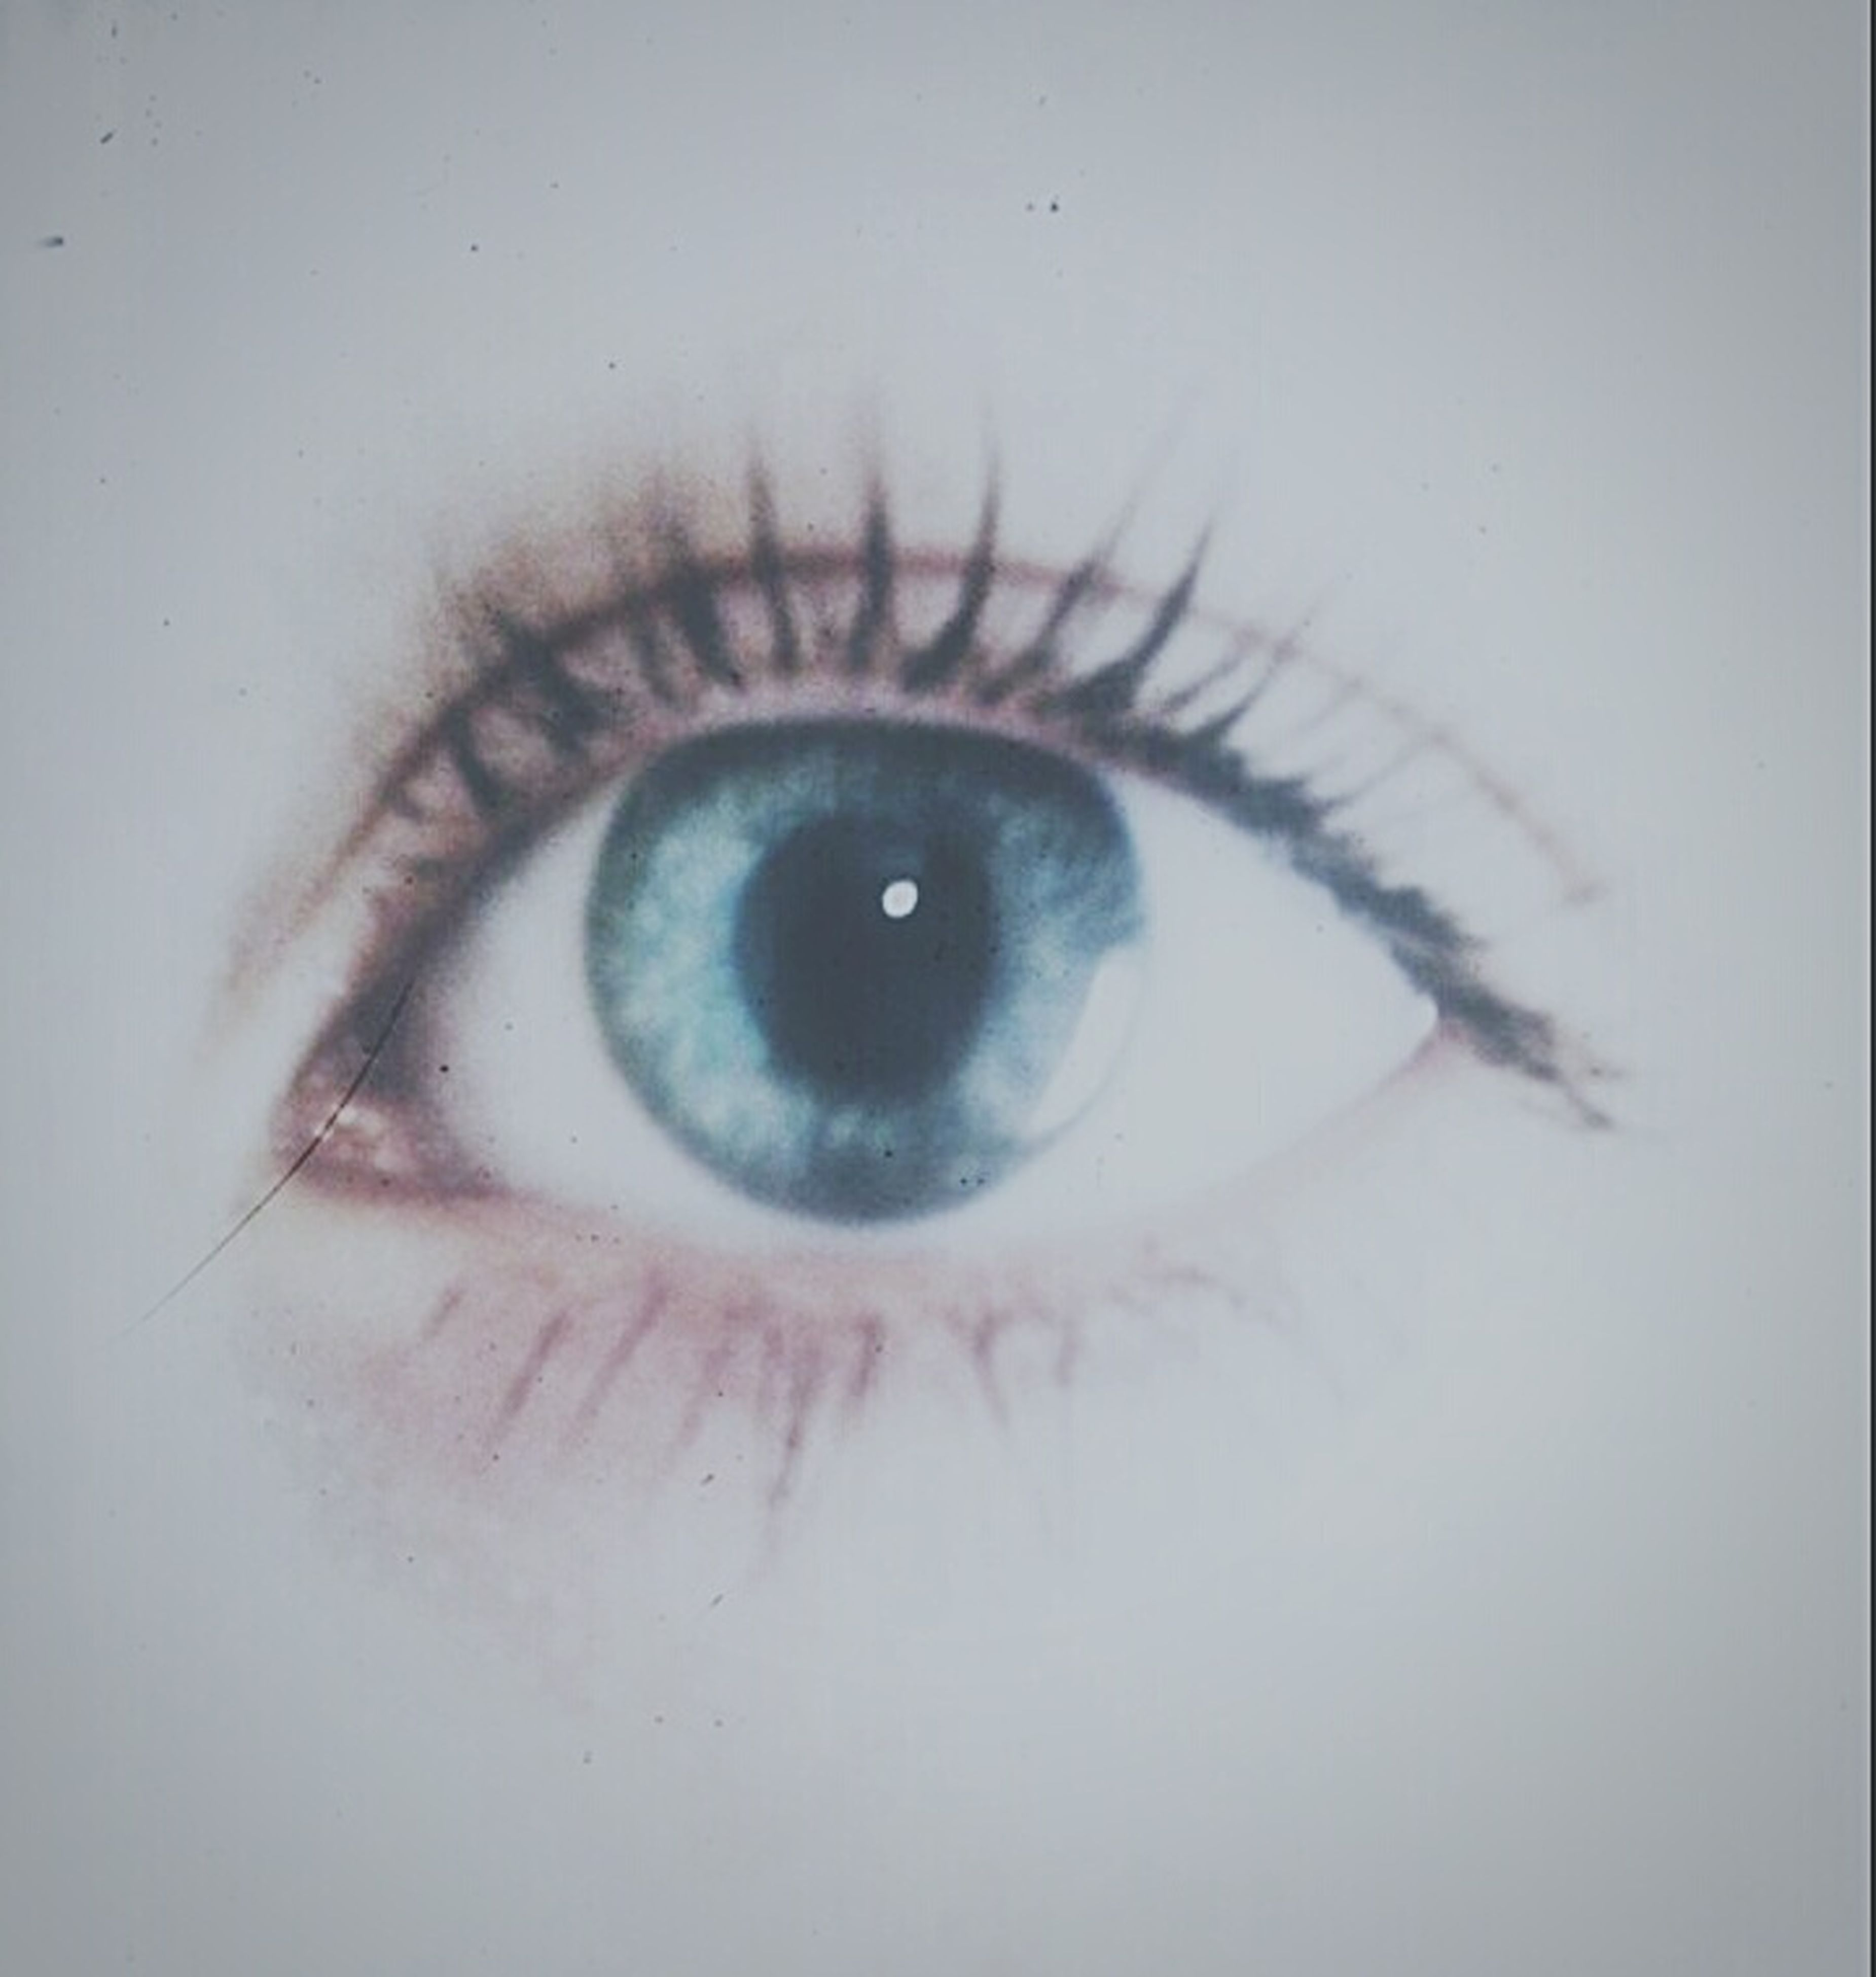 human eye, eyelash, close-up, eyesight, sensory perception, looking at camera, extreme close-up, iris - eye, eyeball, part of, portrait, human skin, indoors, eyebrow, lifestyles, human face, extreme close up